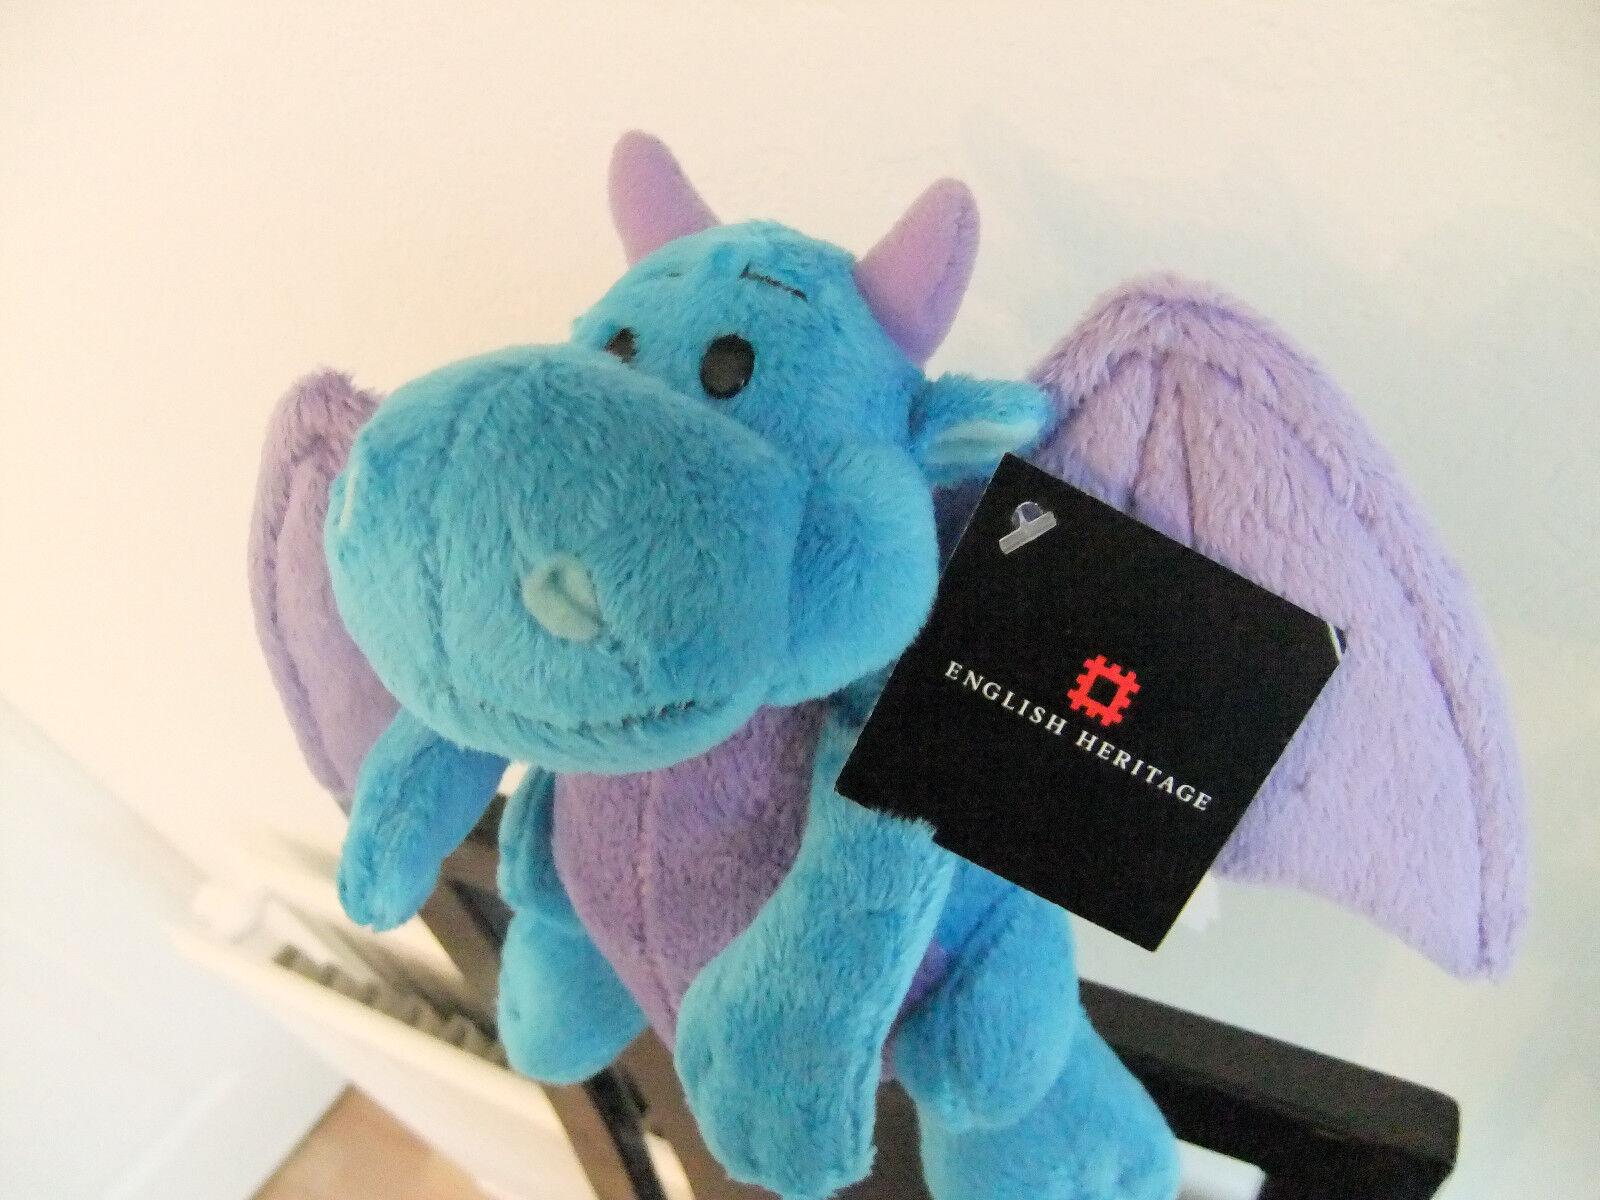 7  ENGLISH HERITAGE blueE PURPLE DRAGON SUKI TEDDY BEAR SOFT CUDDLY TOY NEXT HOLS